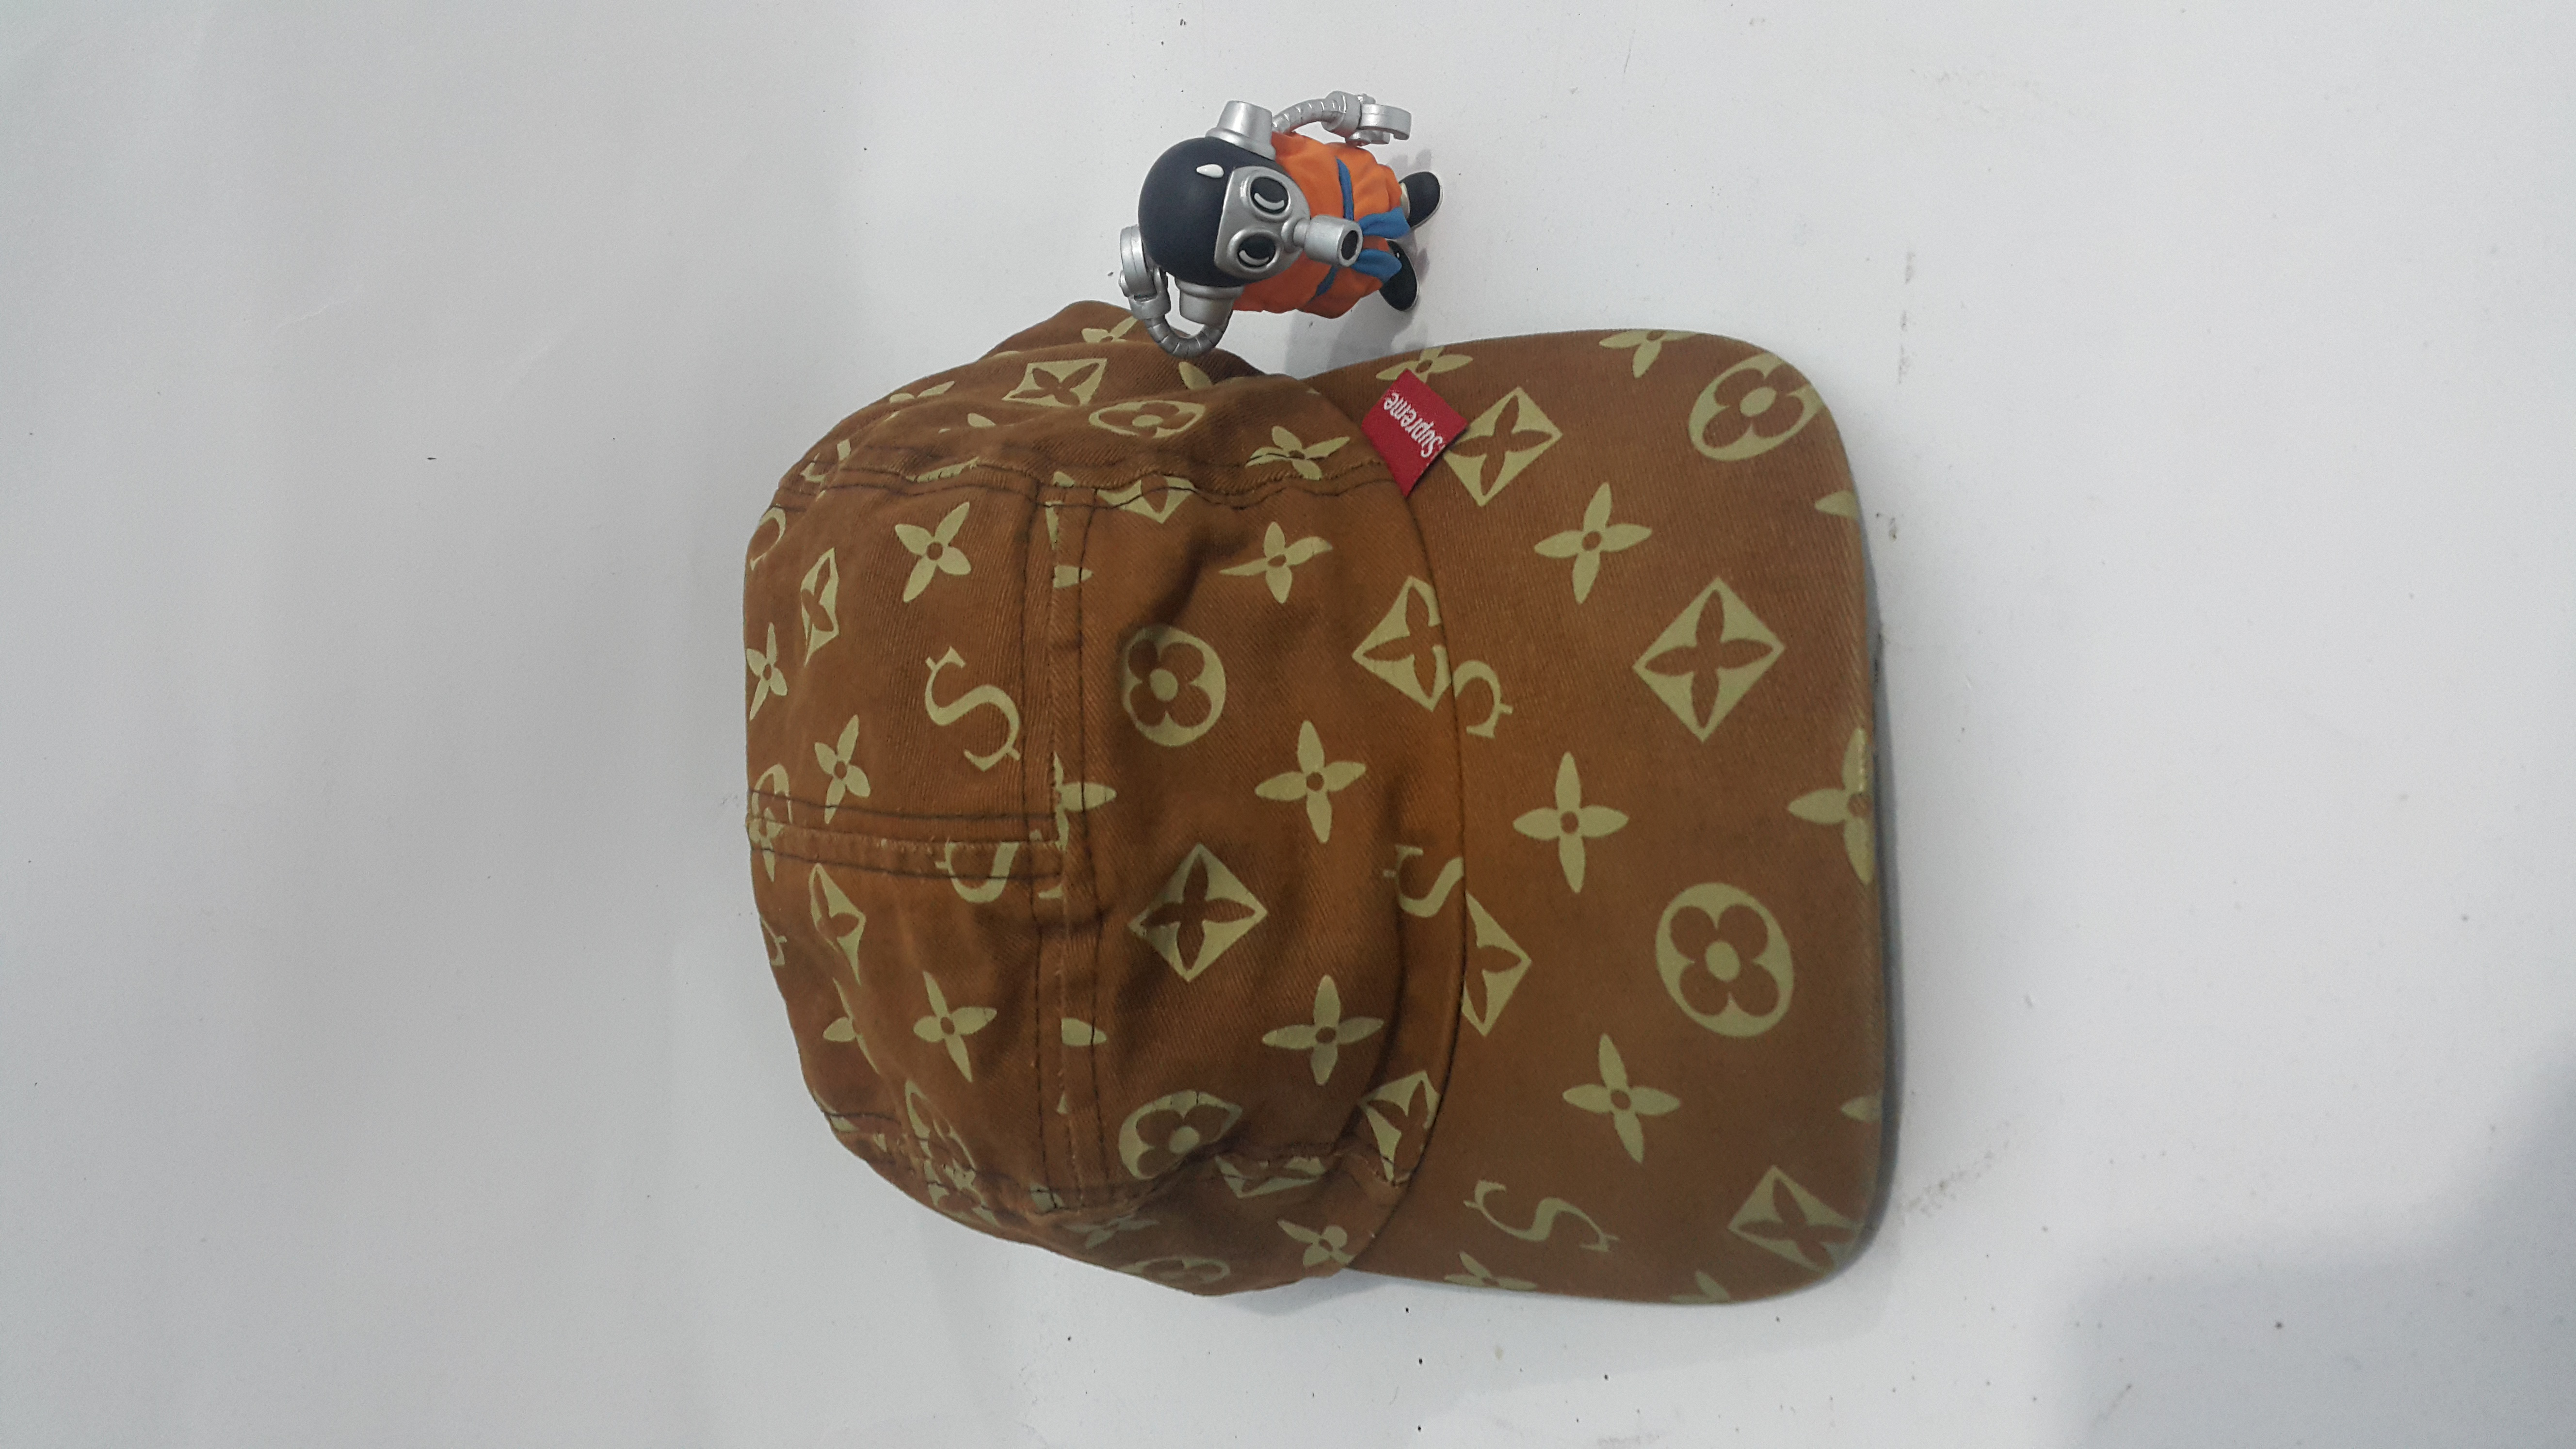 61ffd0ff9f5 Supreme Supreme OG monogram LV camp cap rare Size one size - Hats for Sale  - Grailed